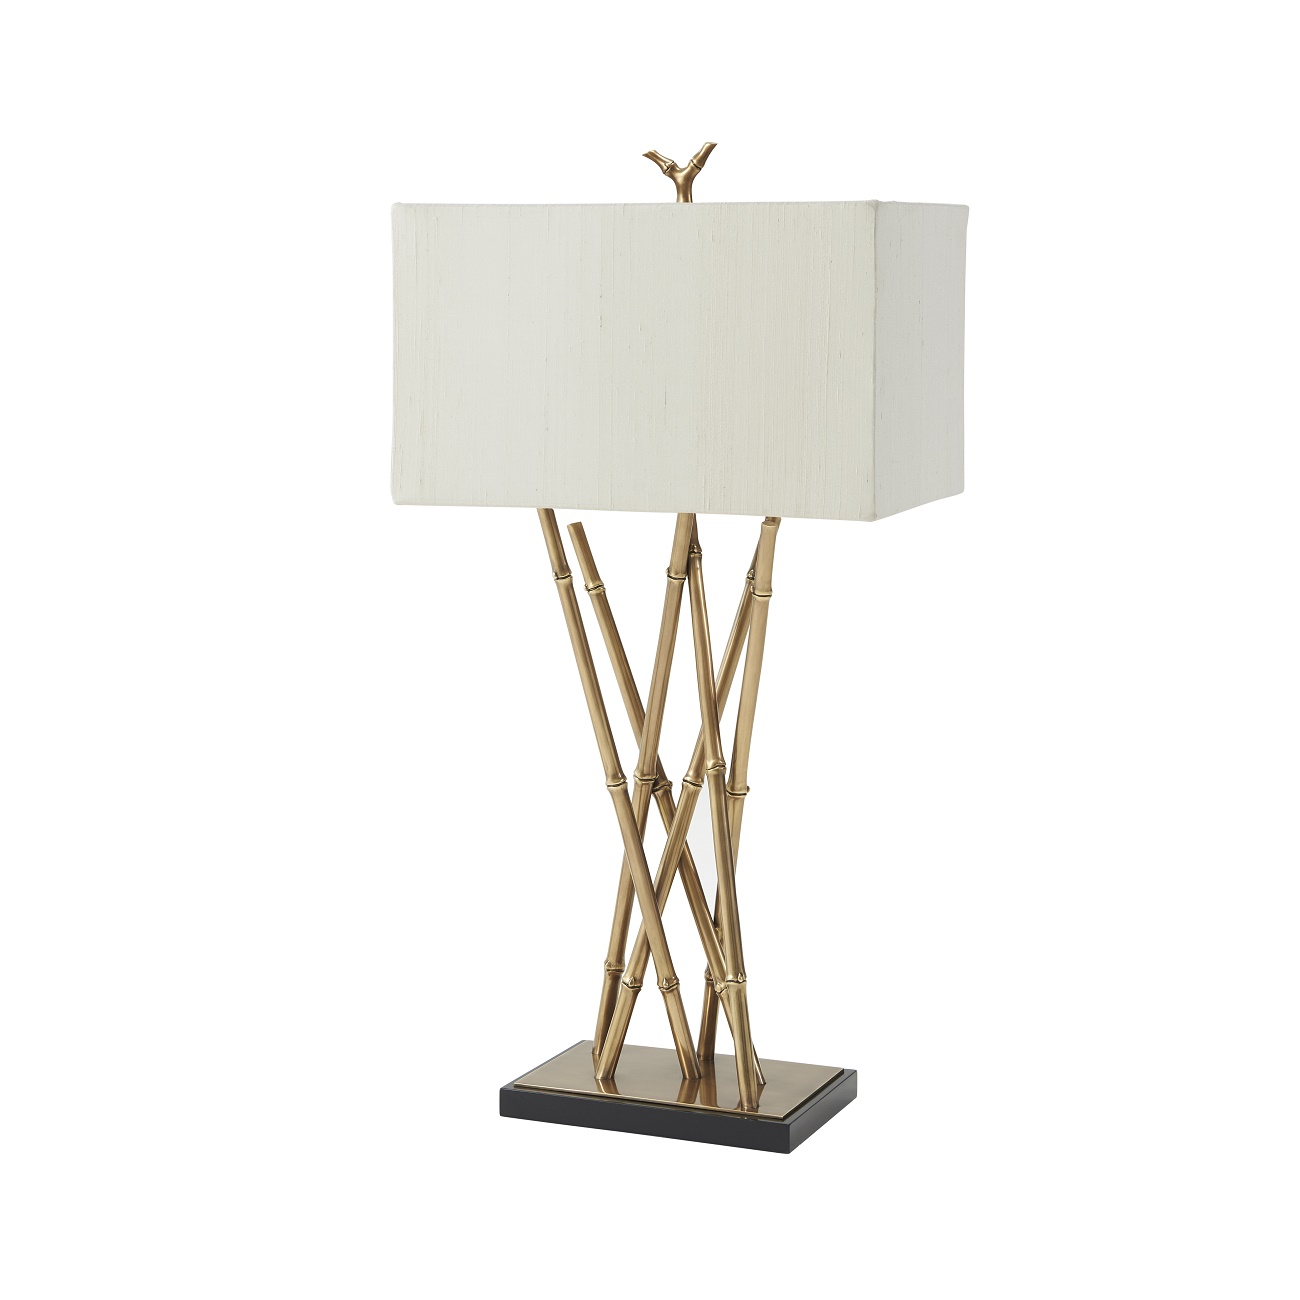 2021 929 Coastal Table Lamp Theodore Alexander